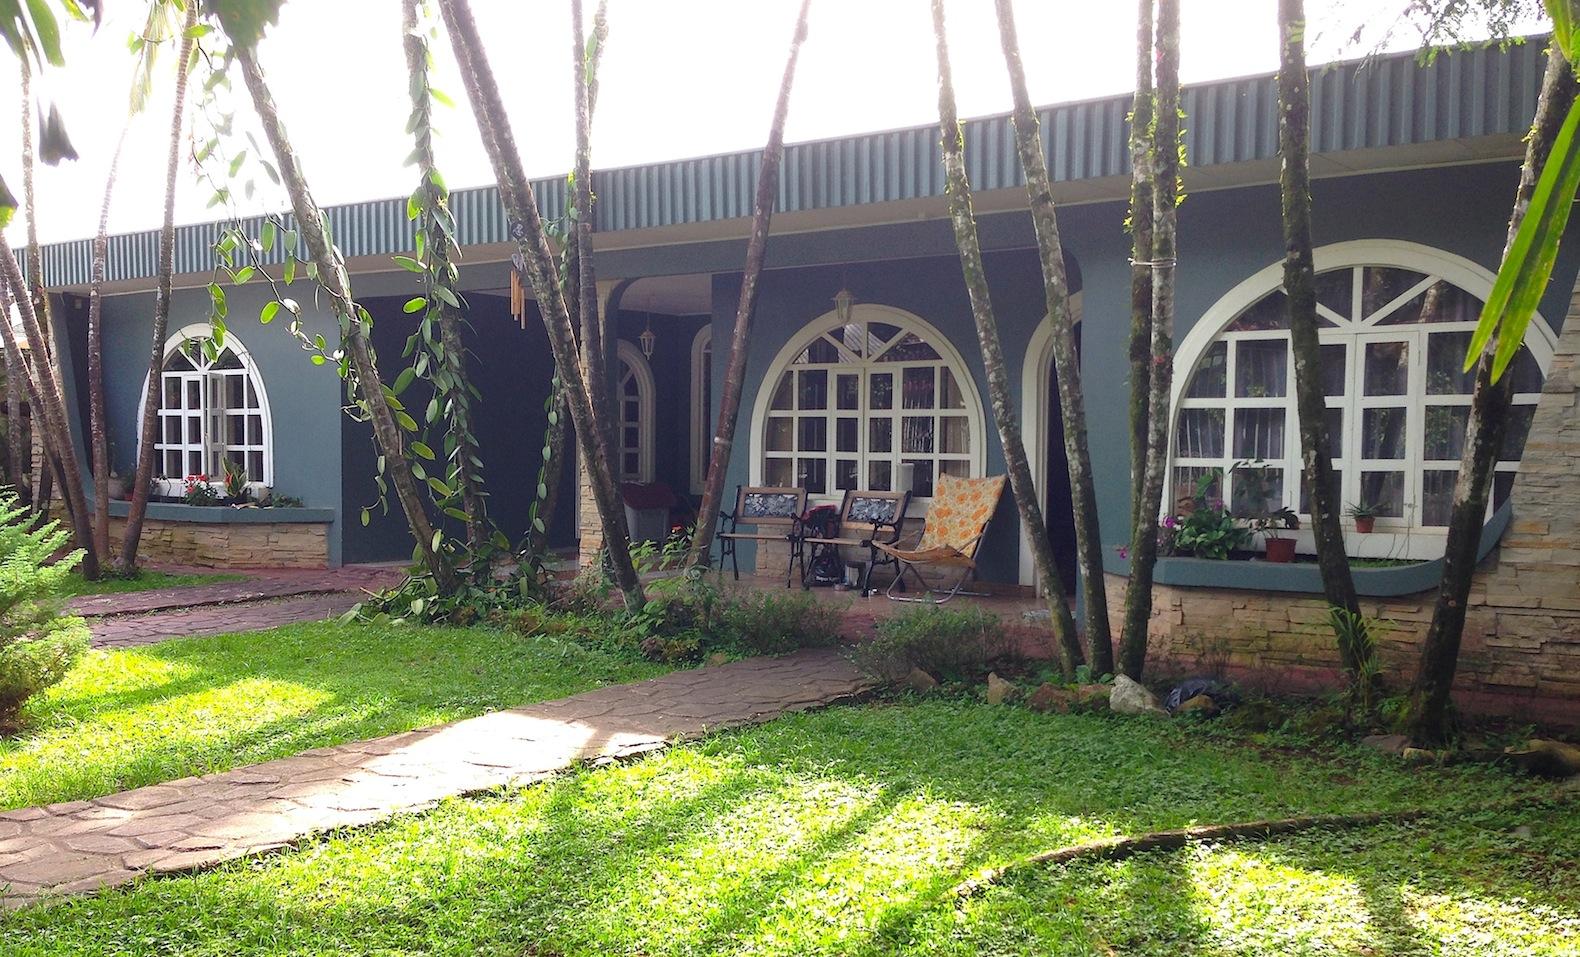 San-Isidro-del-General-Costa-Rica-property-costaricarealestateservicePROP-28821-1.jpg